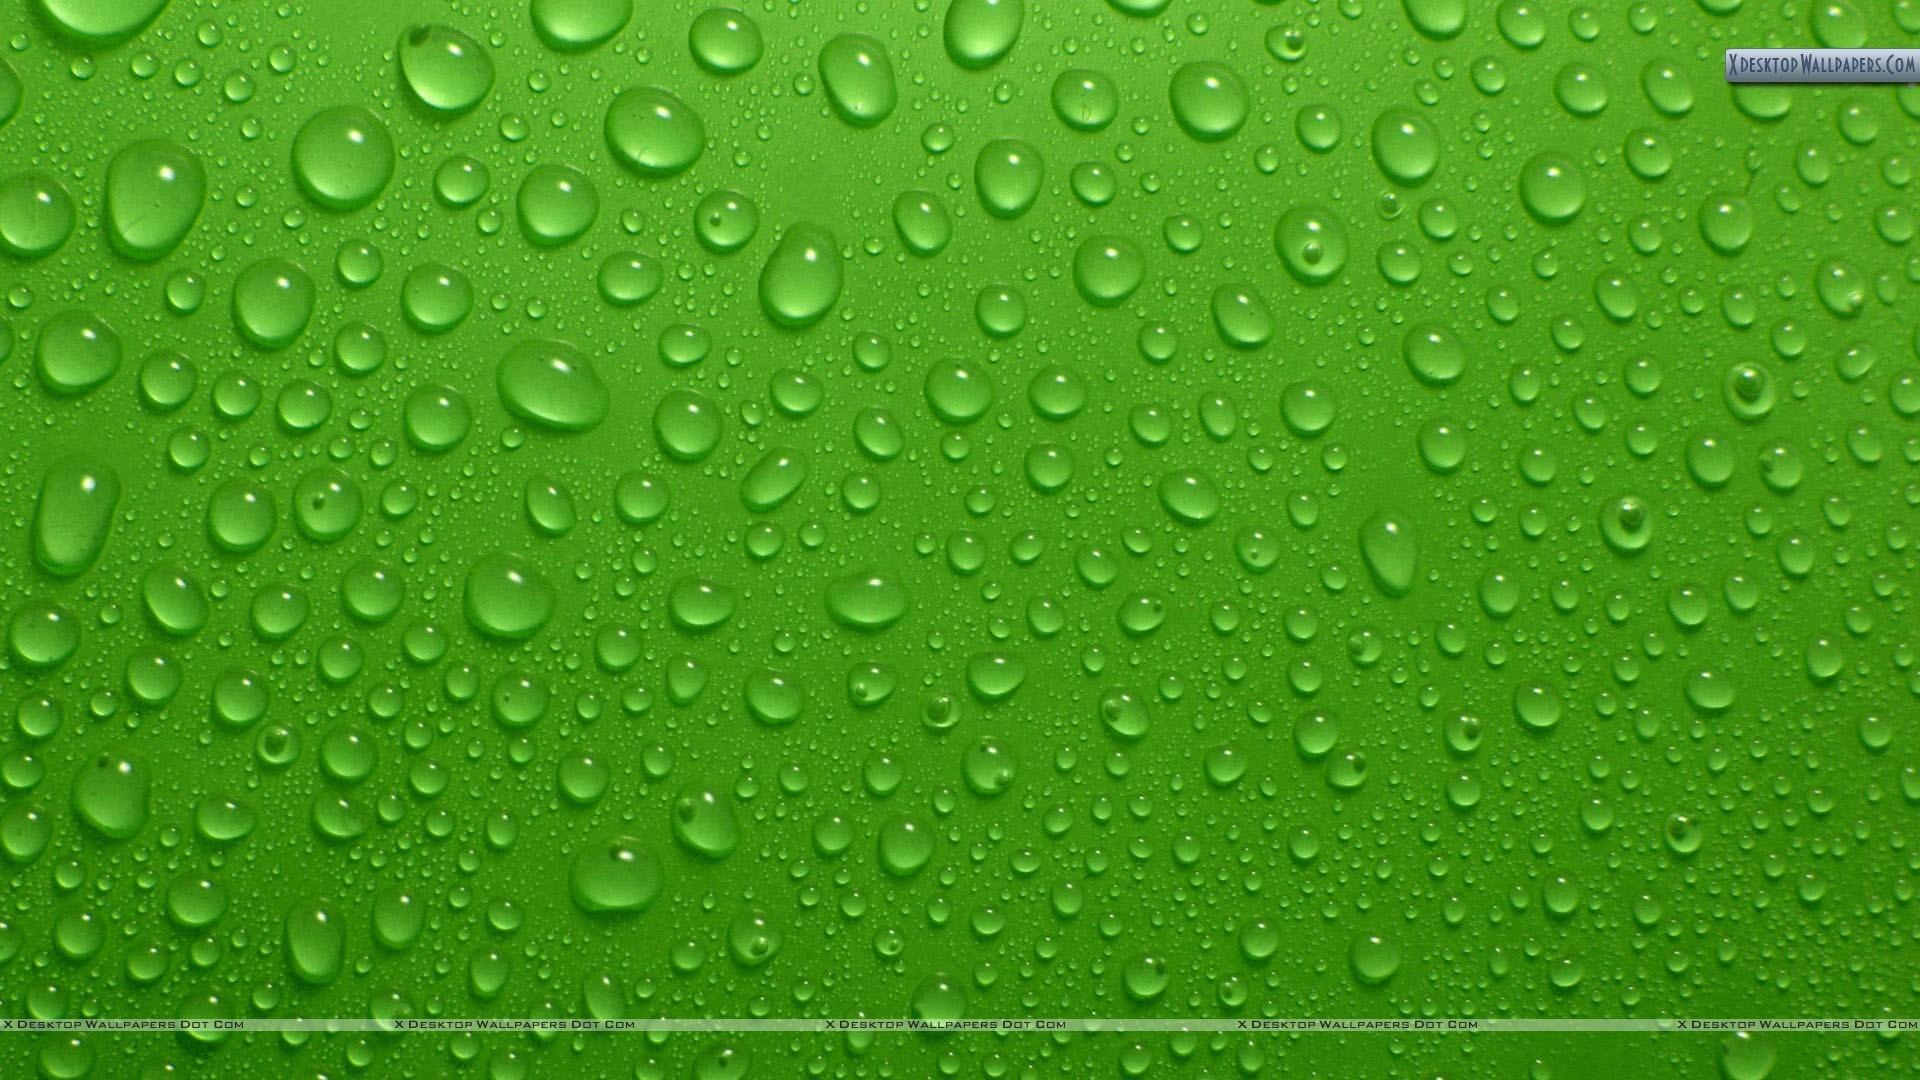 Green Desktop Backgrounds 73 Pictures